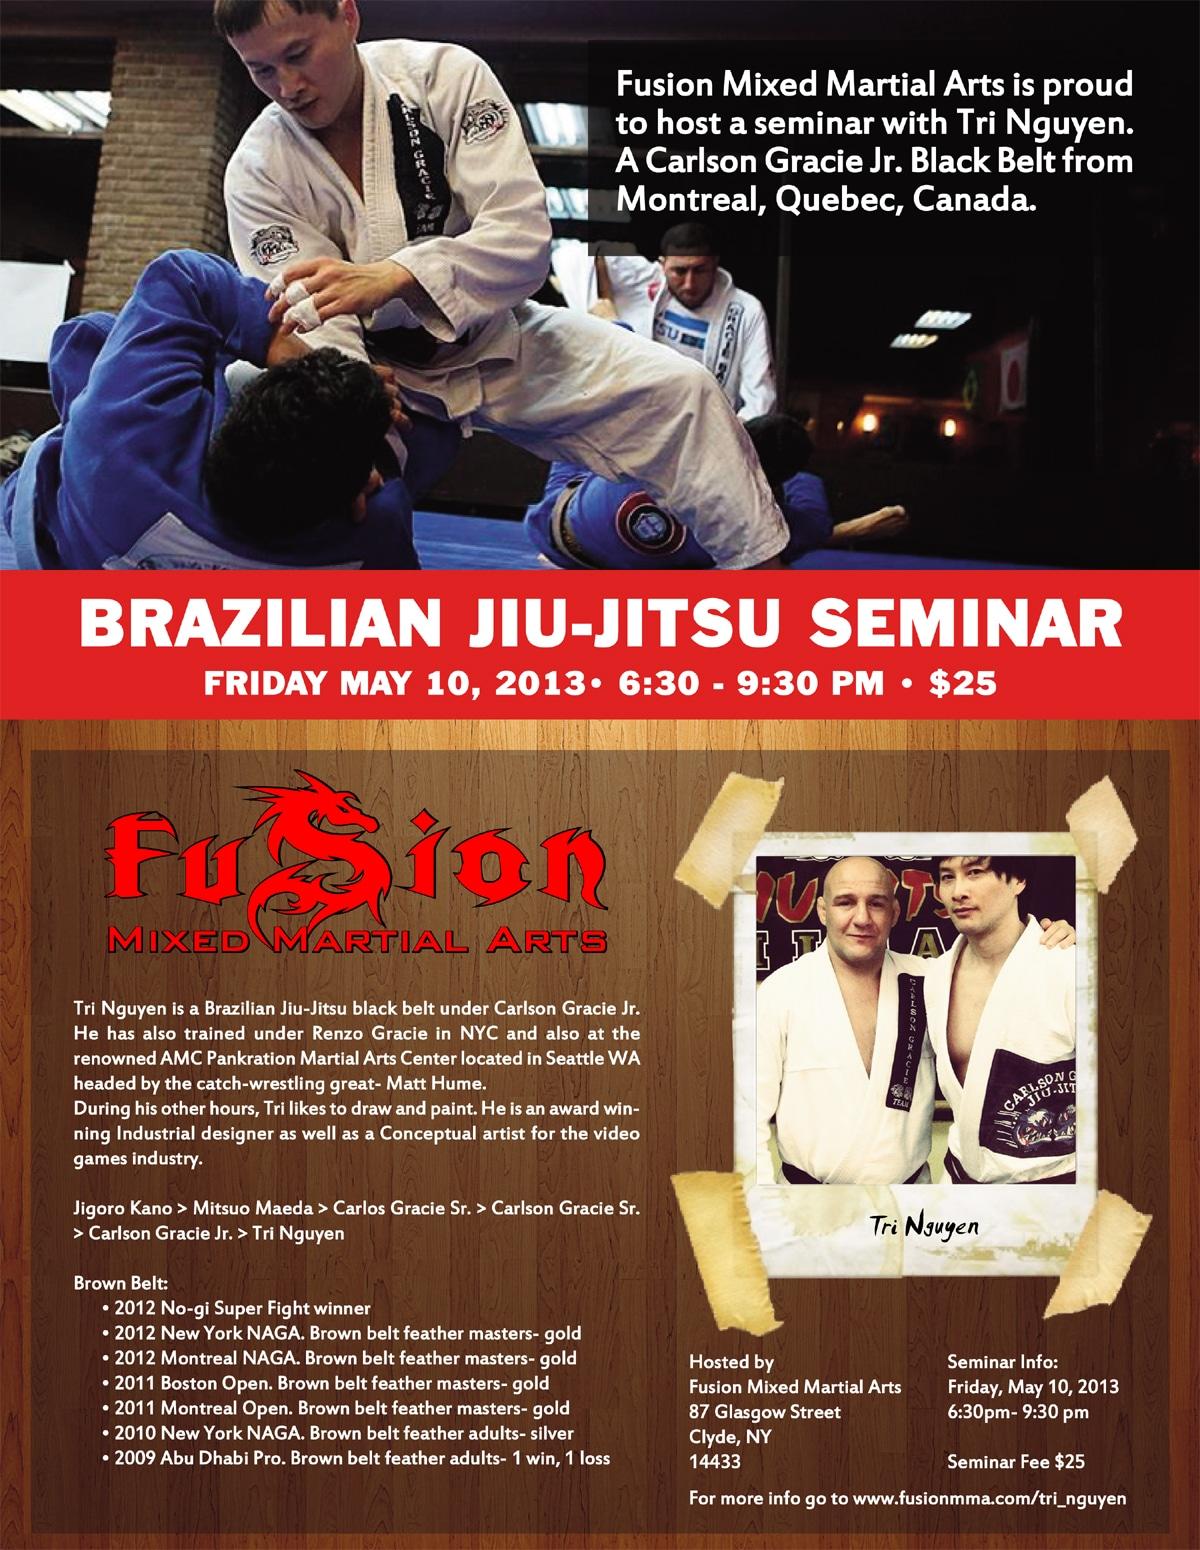 Brazilian Jiu-Jitsu Seminar Flyer